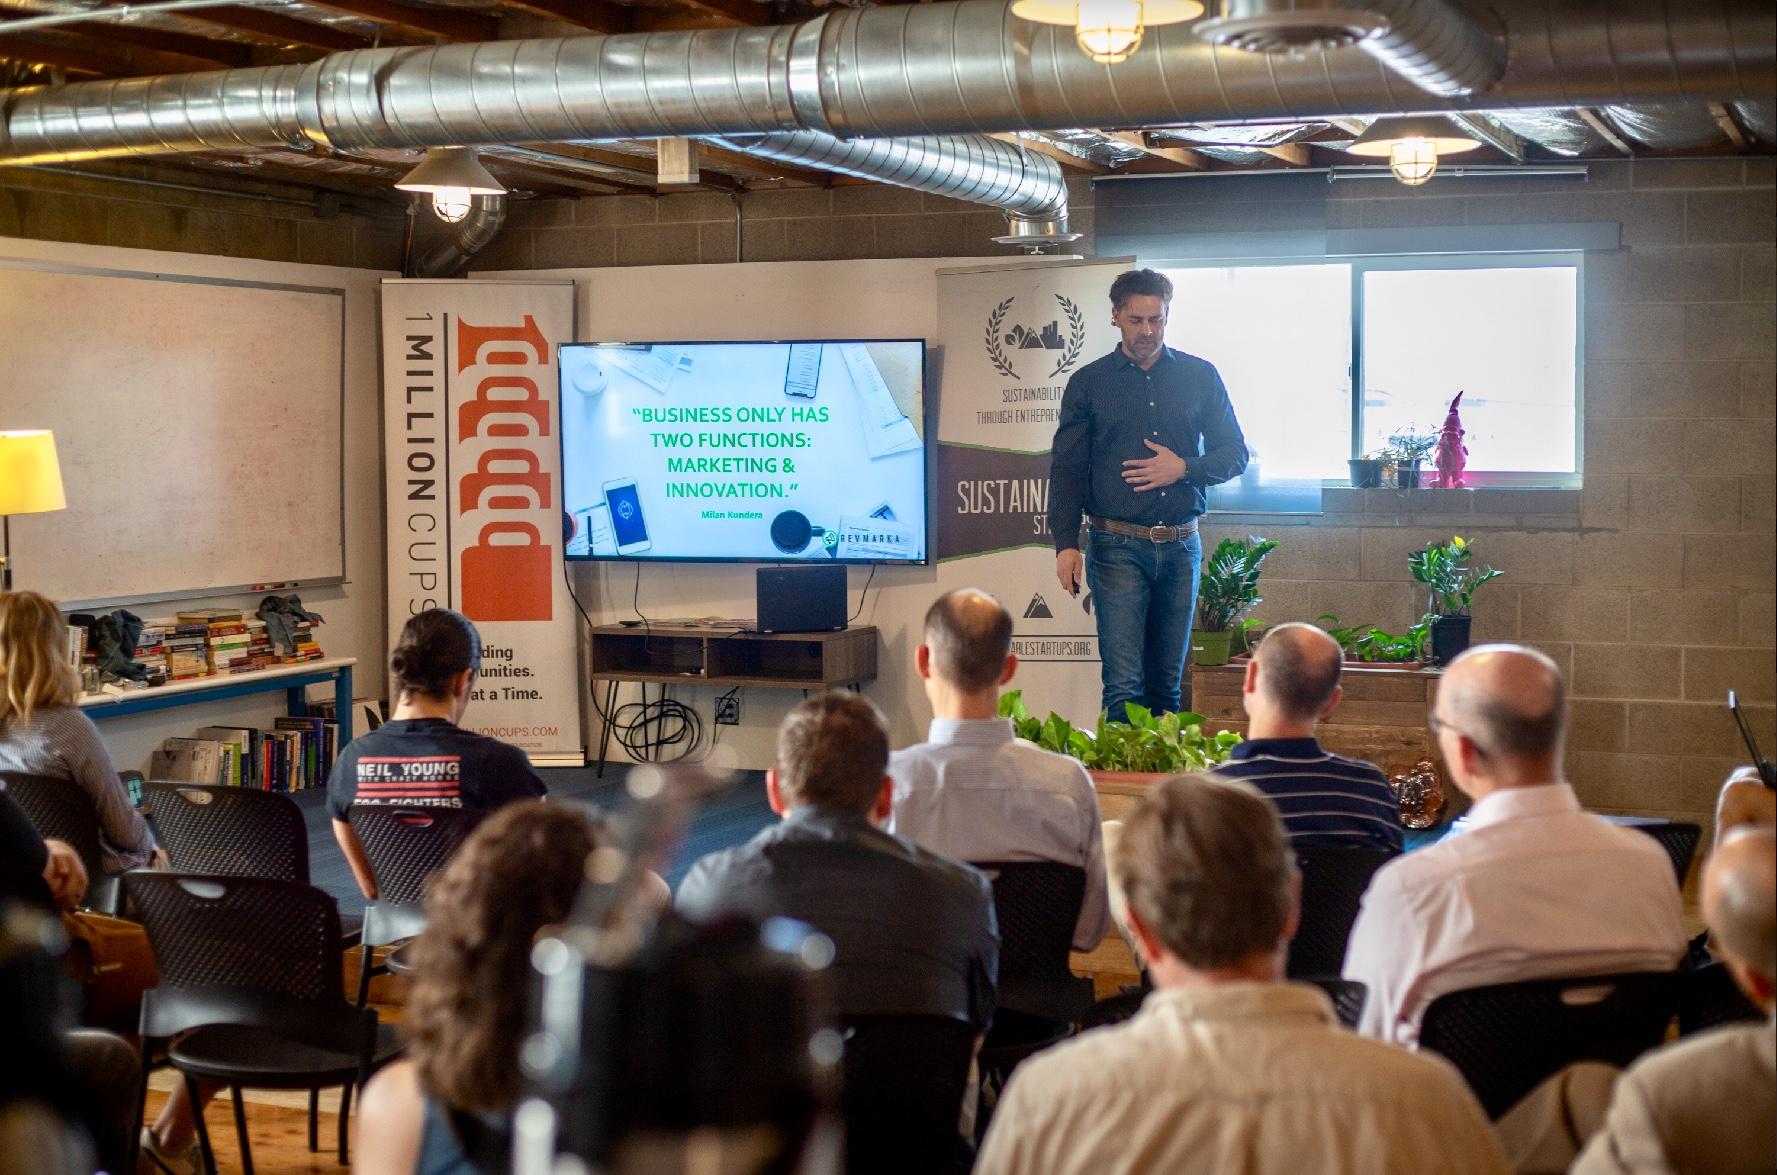 Eric Dahl presenting the 4 Step Marketing Plan for Entrepreneurs. Aug. 15, 2018 (photo credit C. Federer)